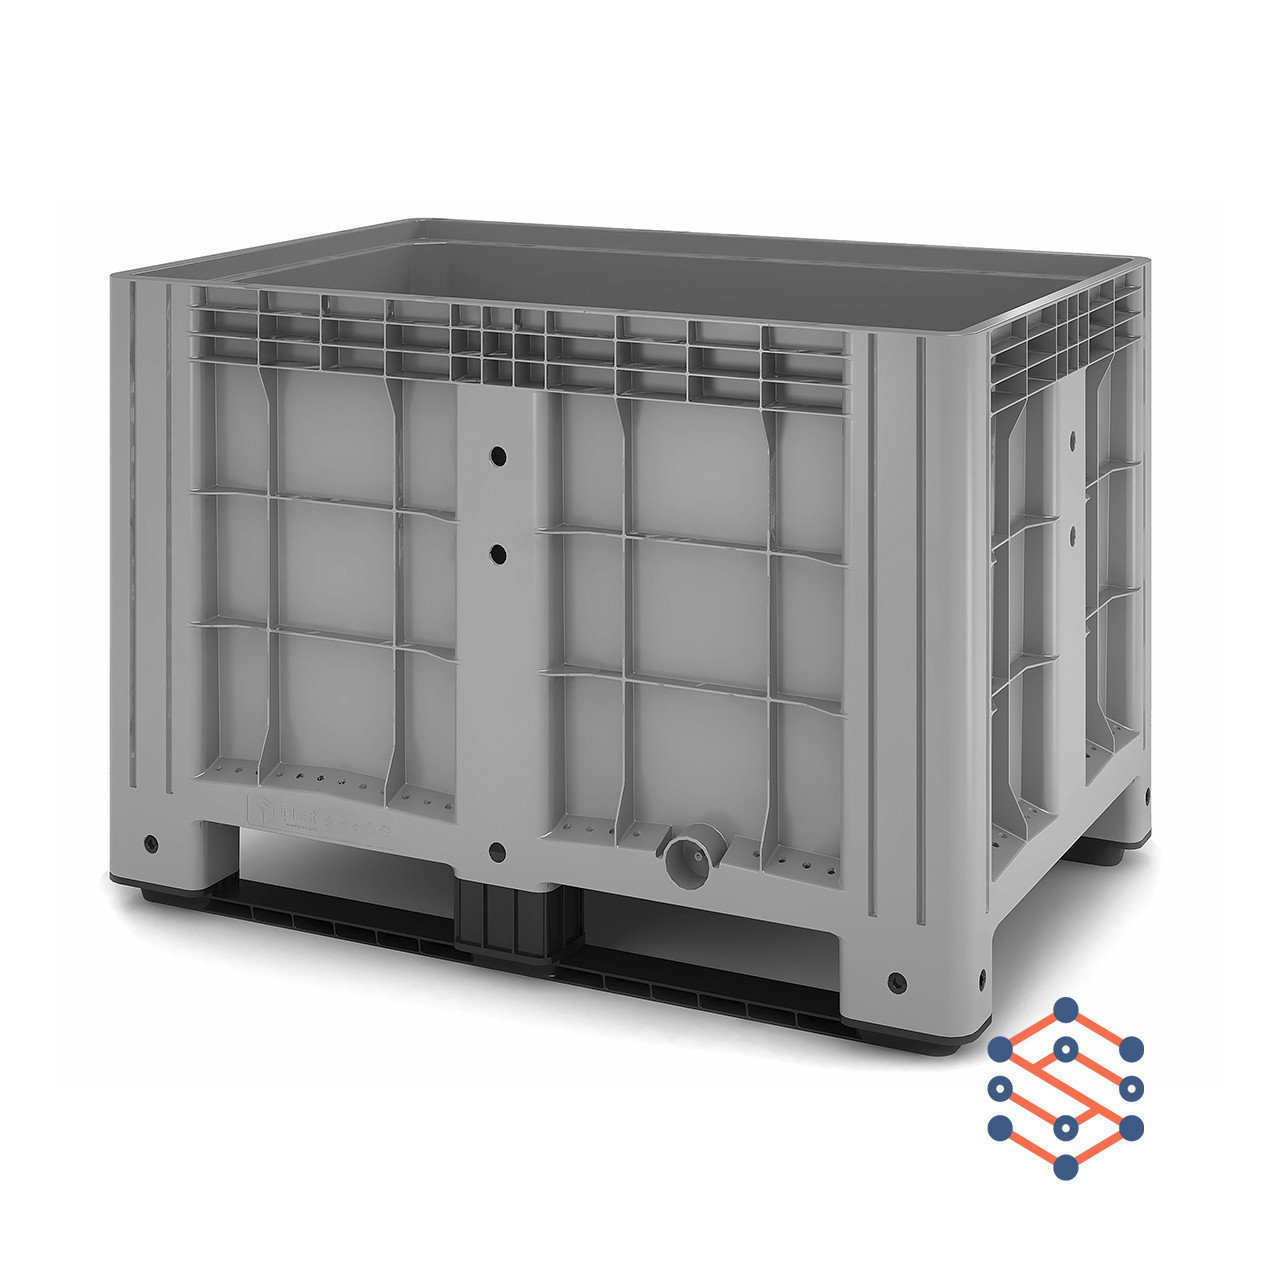 Цельнолитой пластиковый контейнер BigBox на полозьях 1200х800х800 мм